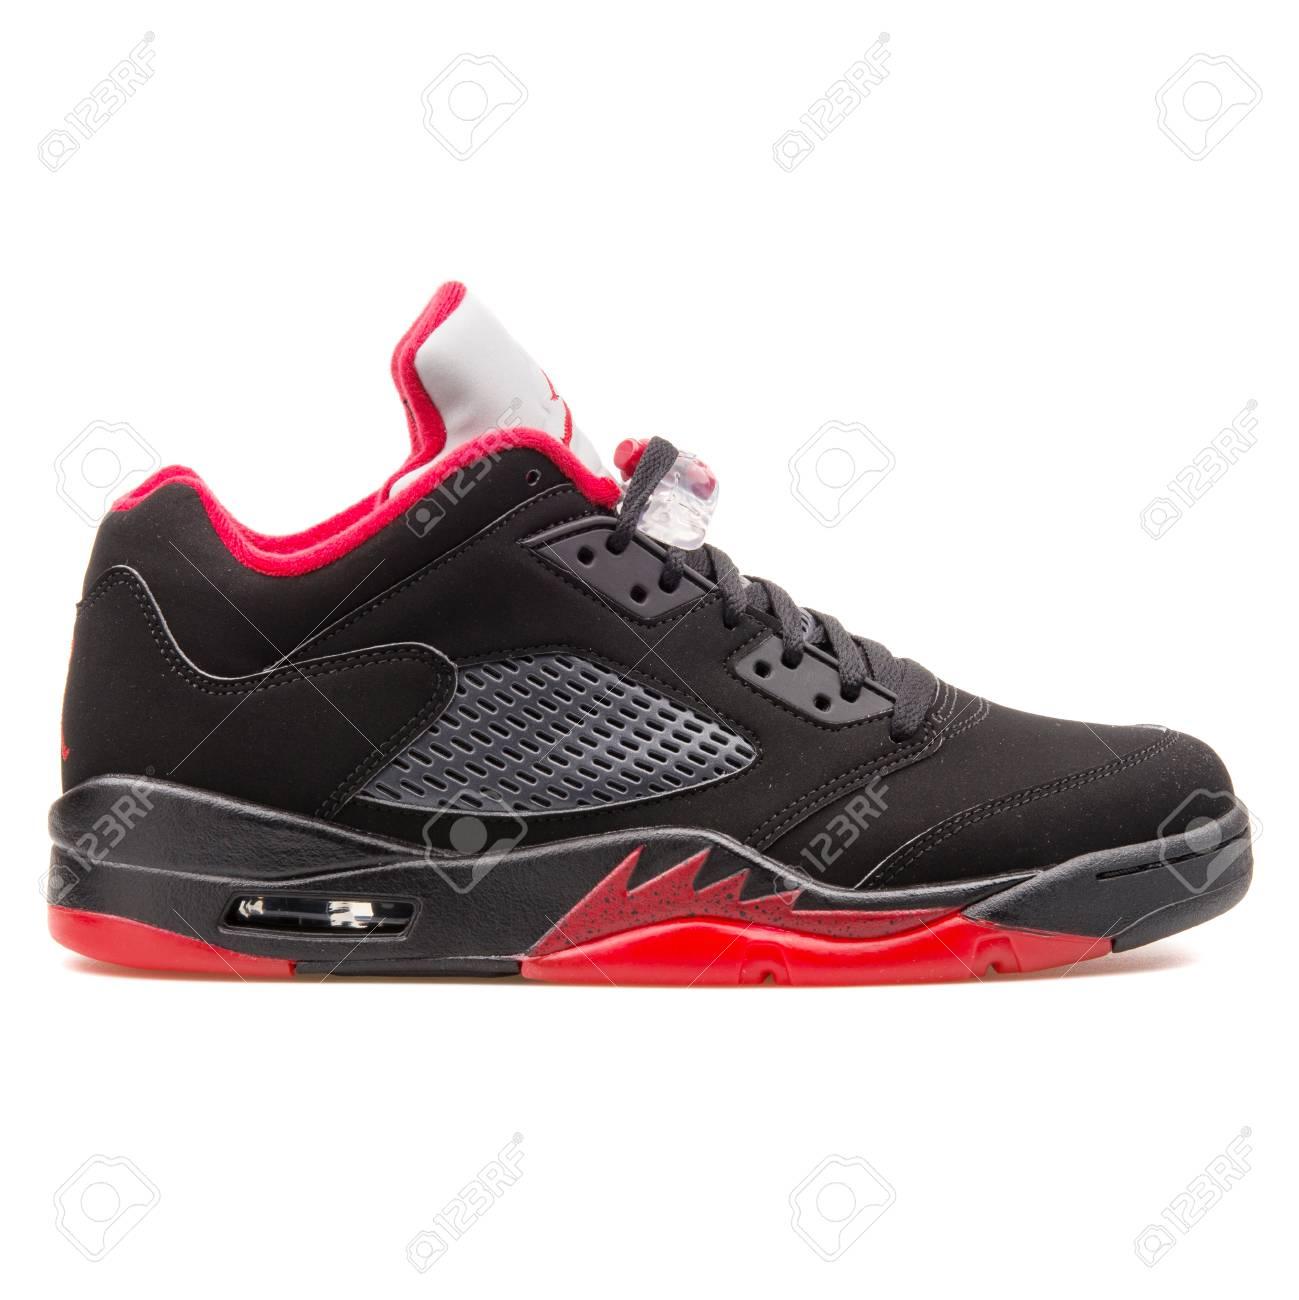 reputable site 85217 5c70b VIENNA, AUSTRIA - JUNE 14, 2017: Nike Air Jordan 5 Retro Low..